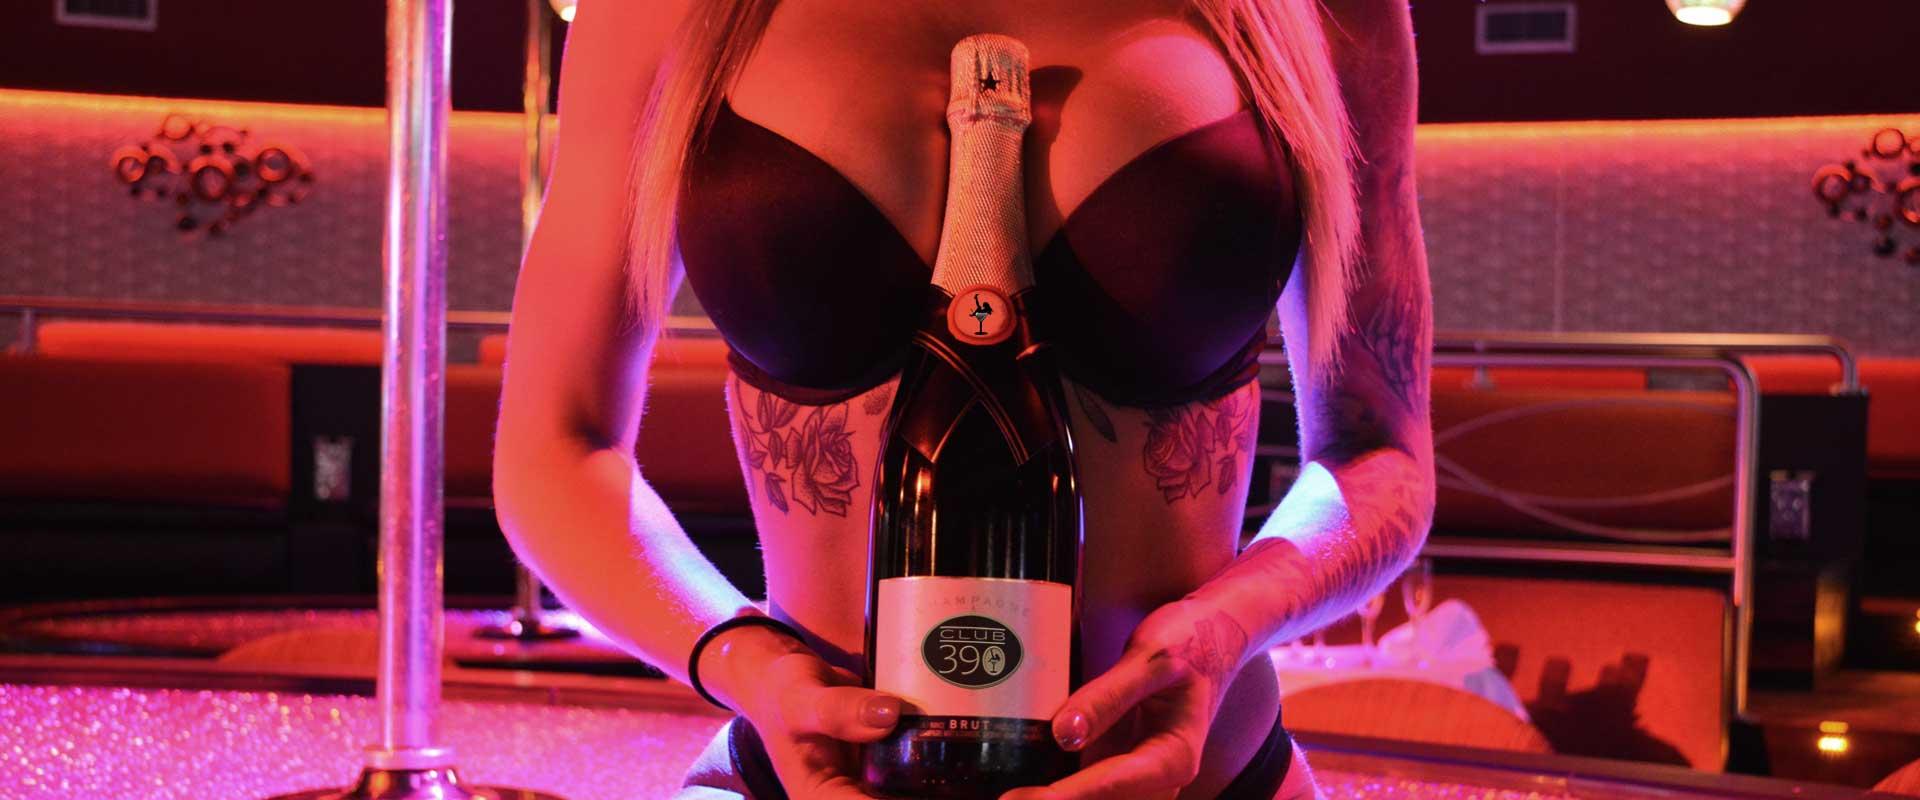 Strip-Club-Full-Liquor-Bar